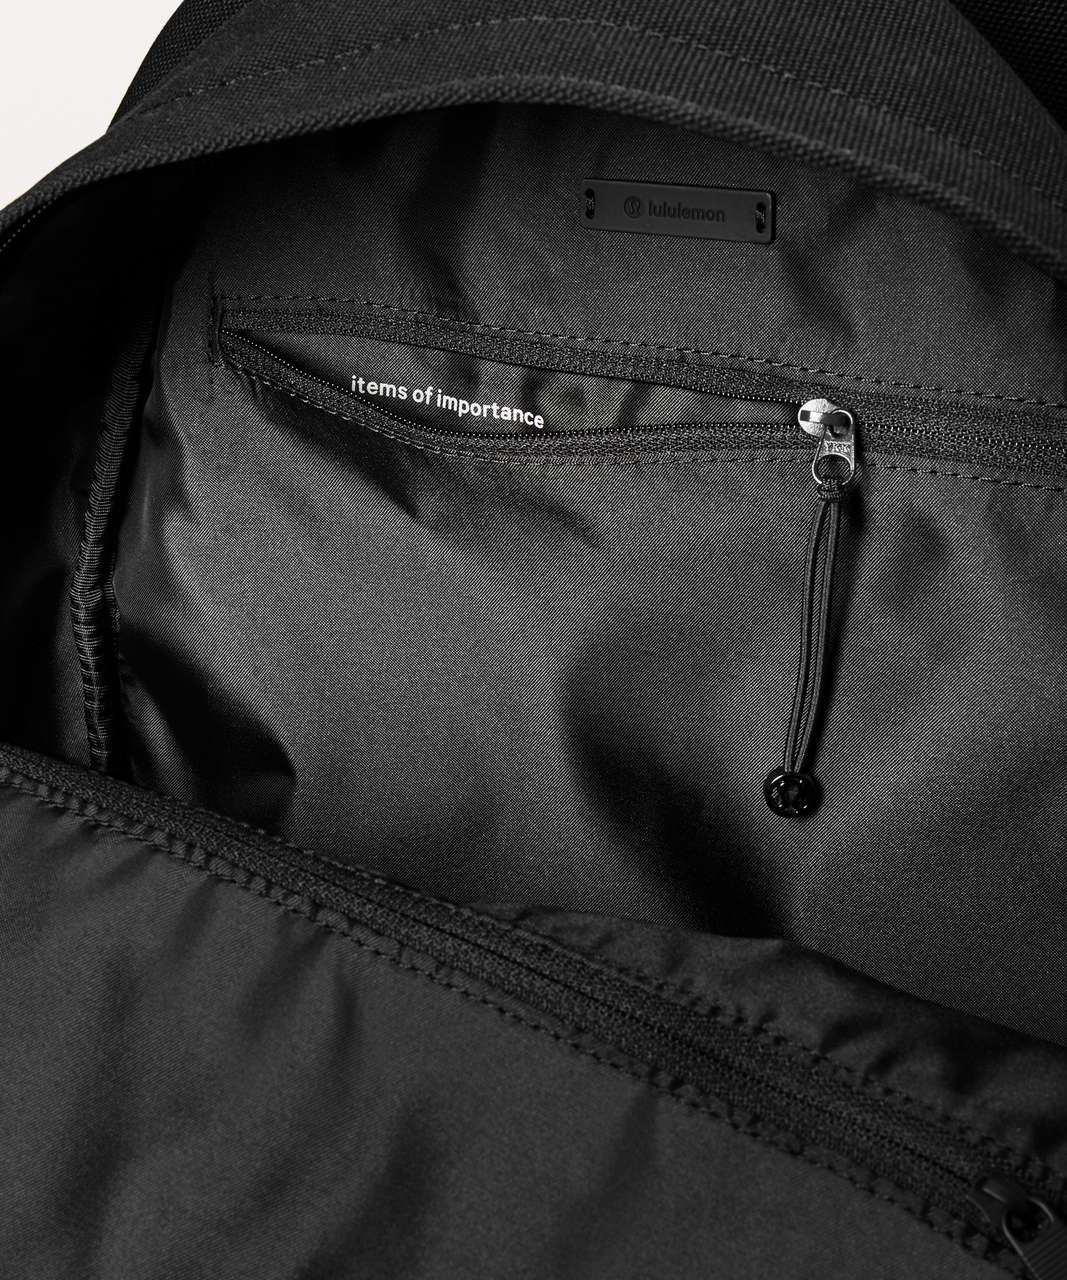 Lululemon Everywhere Backpack *17L - Black